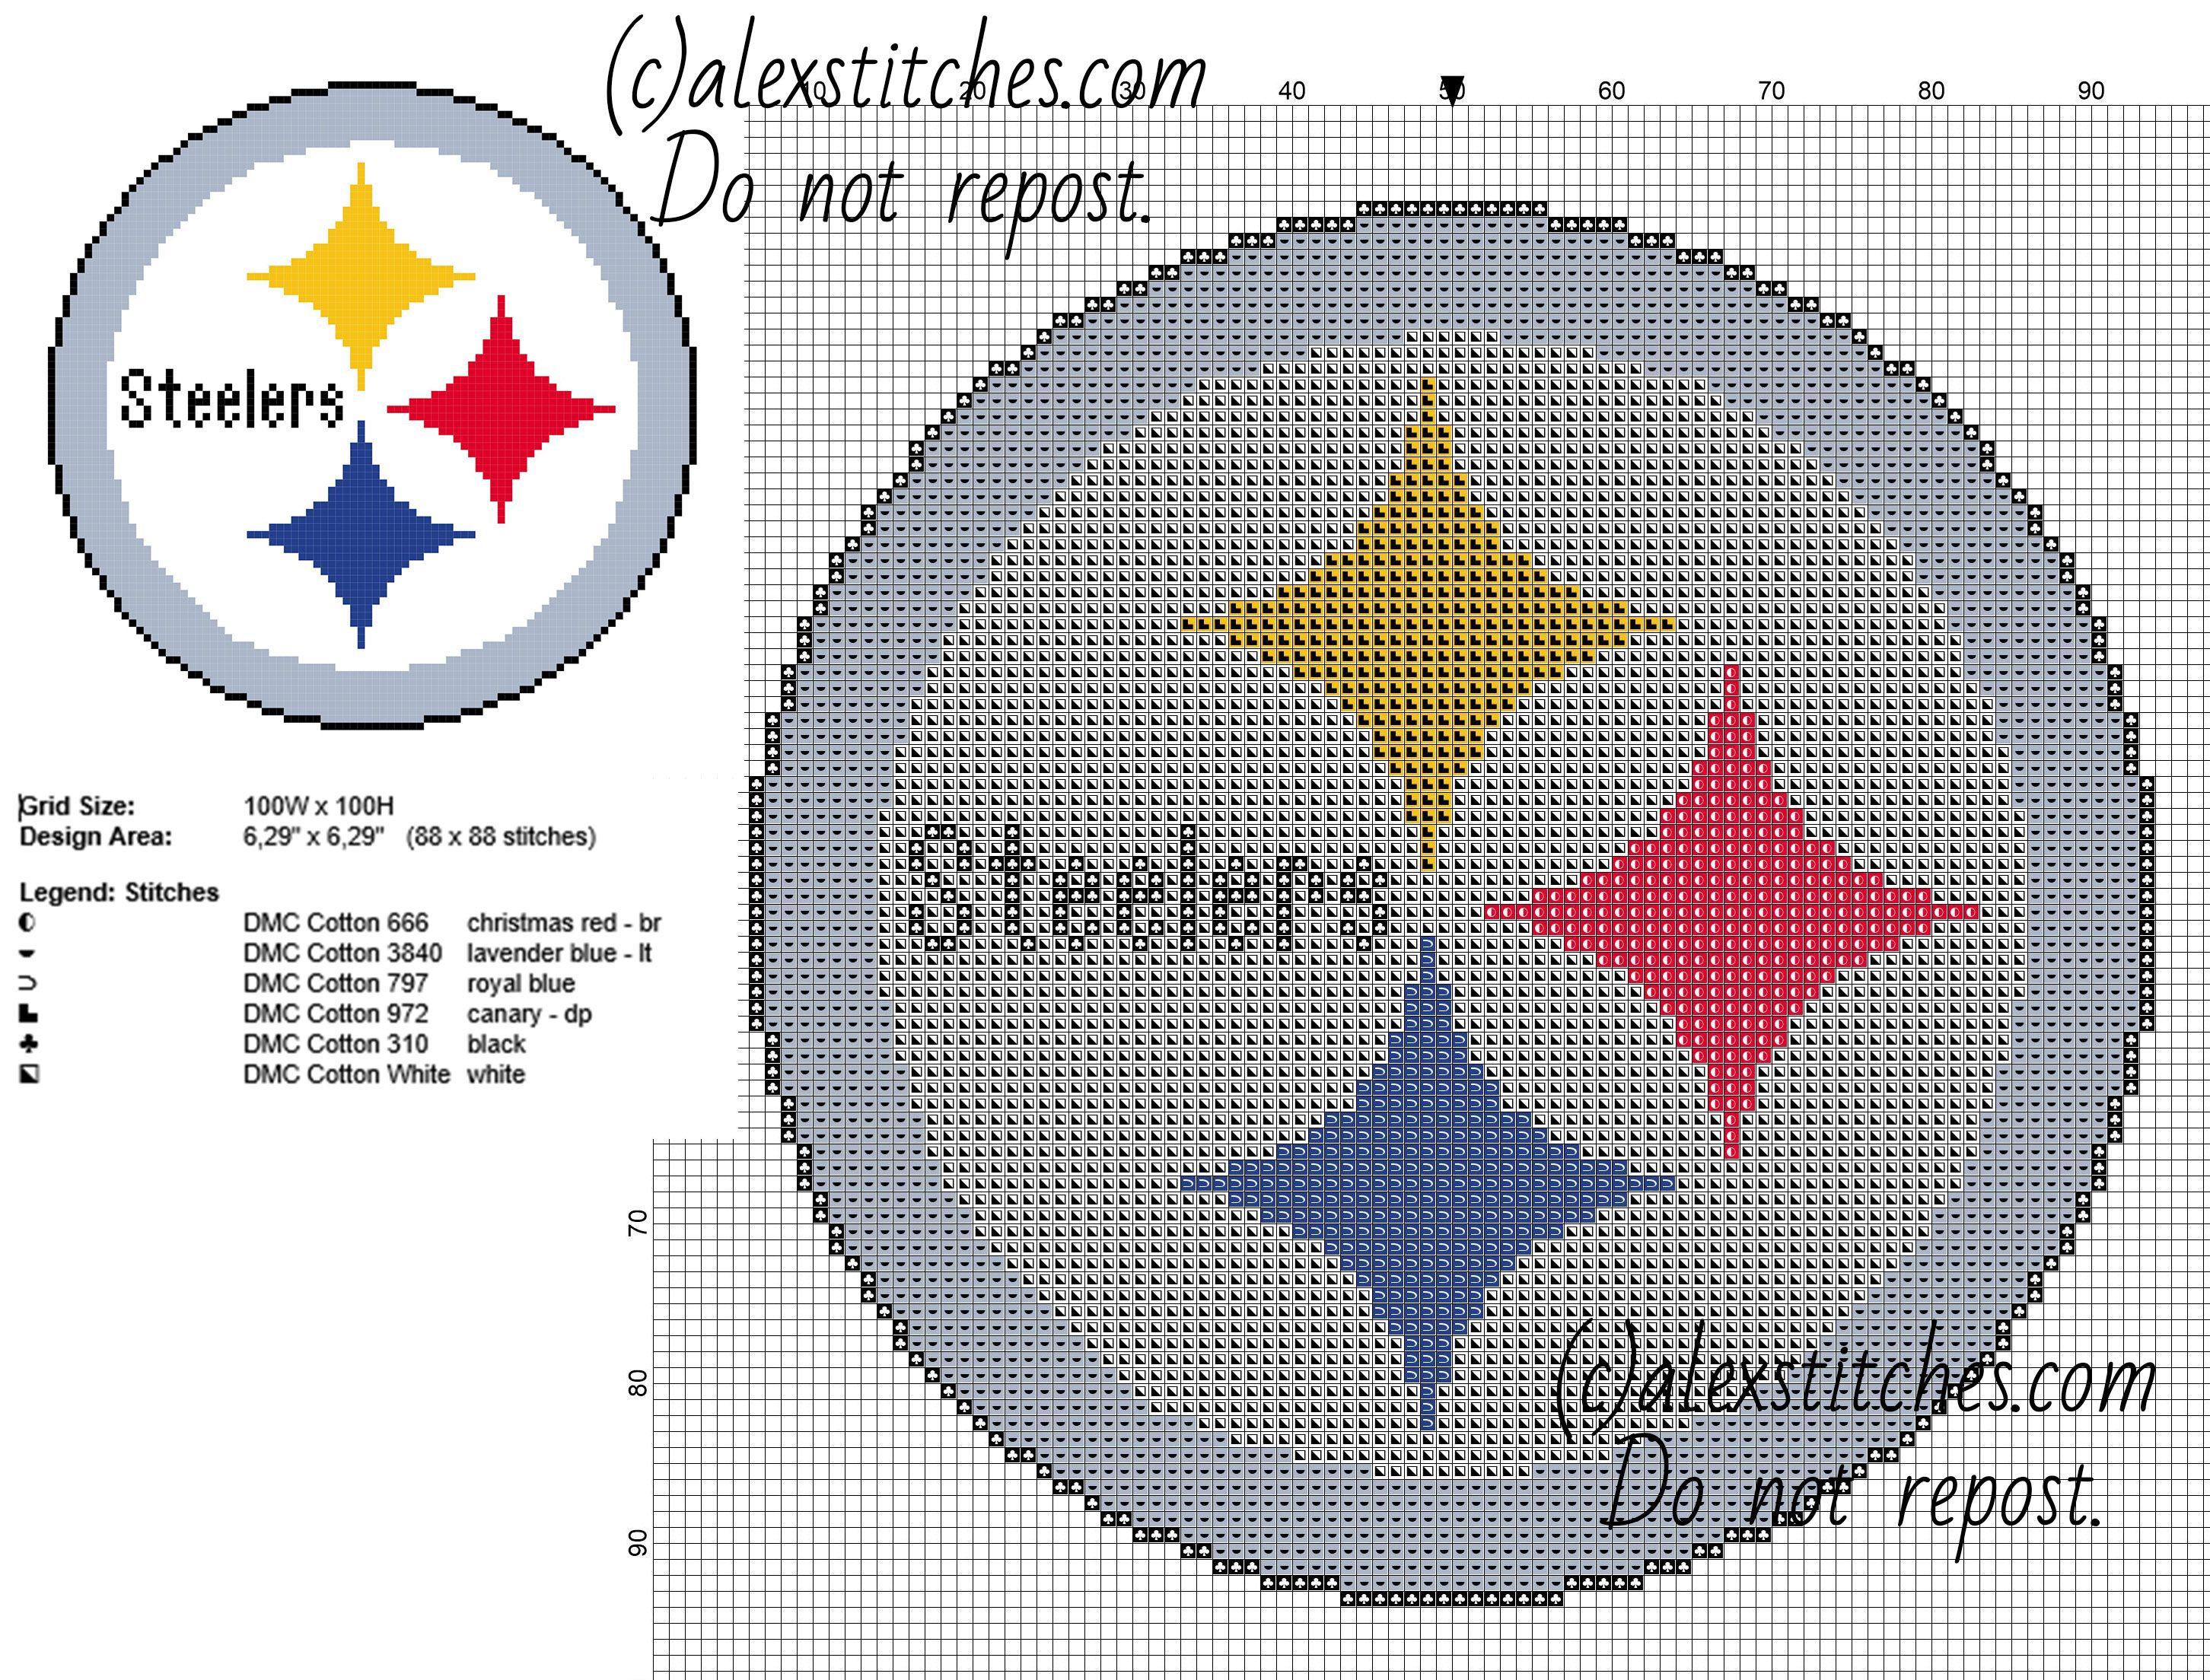 Pittsburg Steelers Logo Nfl National Football League Team Free Cross Stitch Pattern Free Cross Stitch Stitch Patterns Counted Cross Stitch Patterns